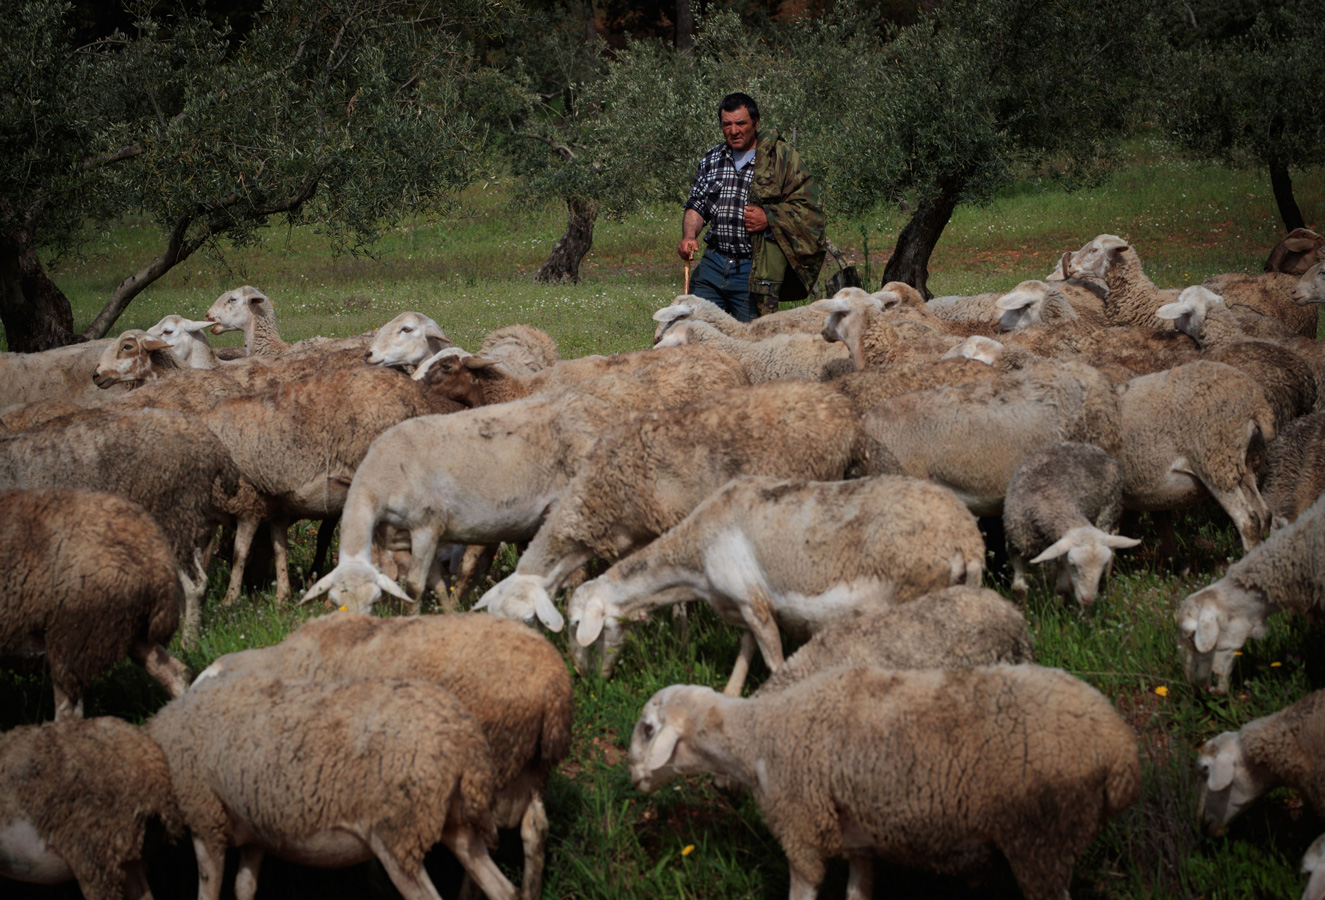 La Alhambra vuelve a recuperar la actividad del pastoreo en la zona del olivar de la Dehesa del Generalife